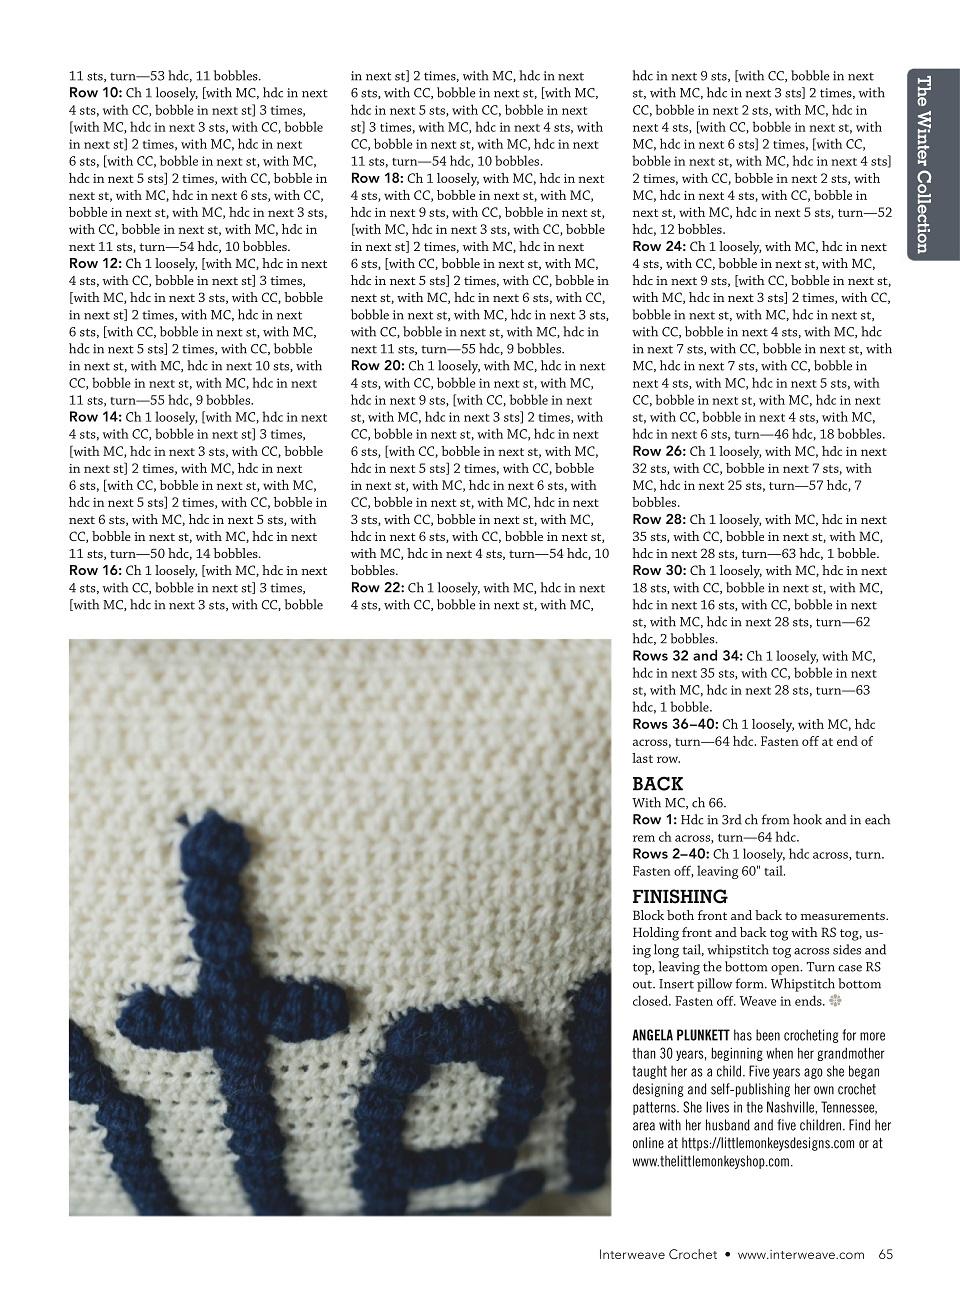 Interweave Crochet Winter 2019-66